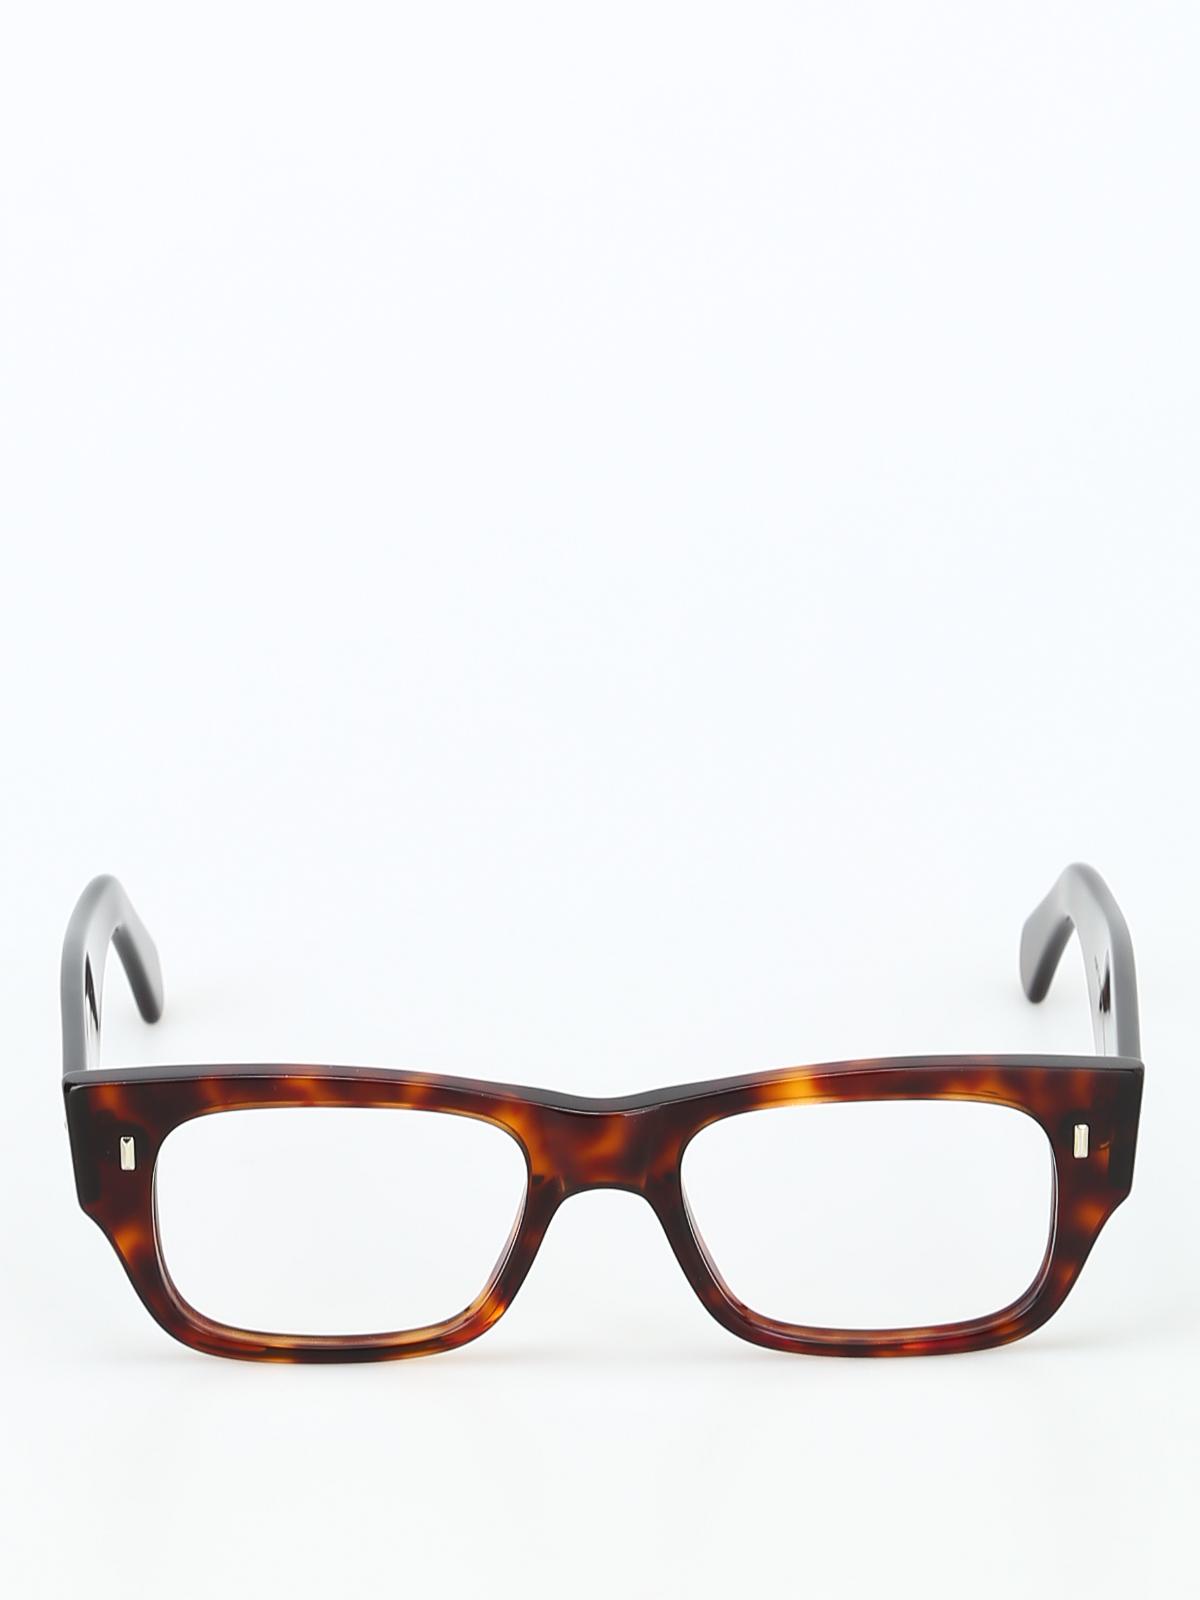 f52df6f6d3f iKRIX CUTLER AND GROSS  Glasses - Flattened thick tortoise frame glasses